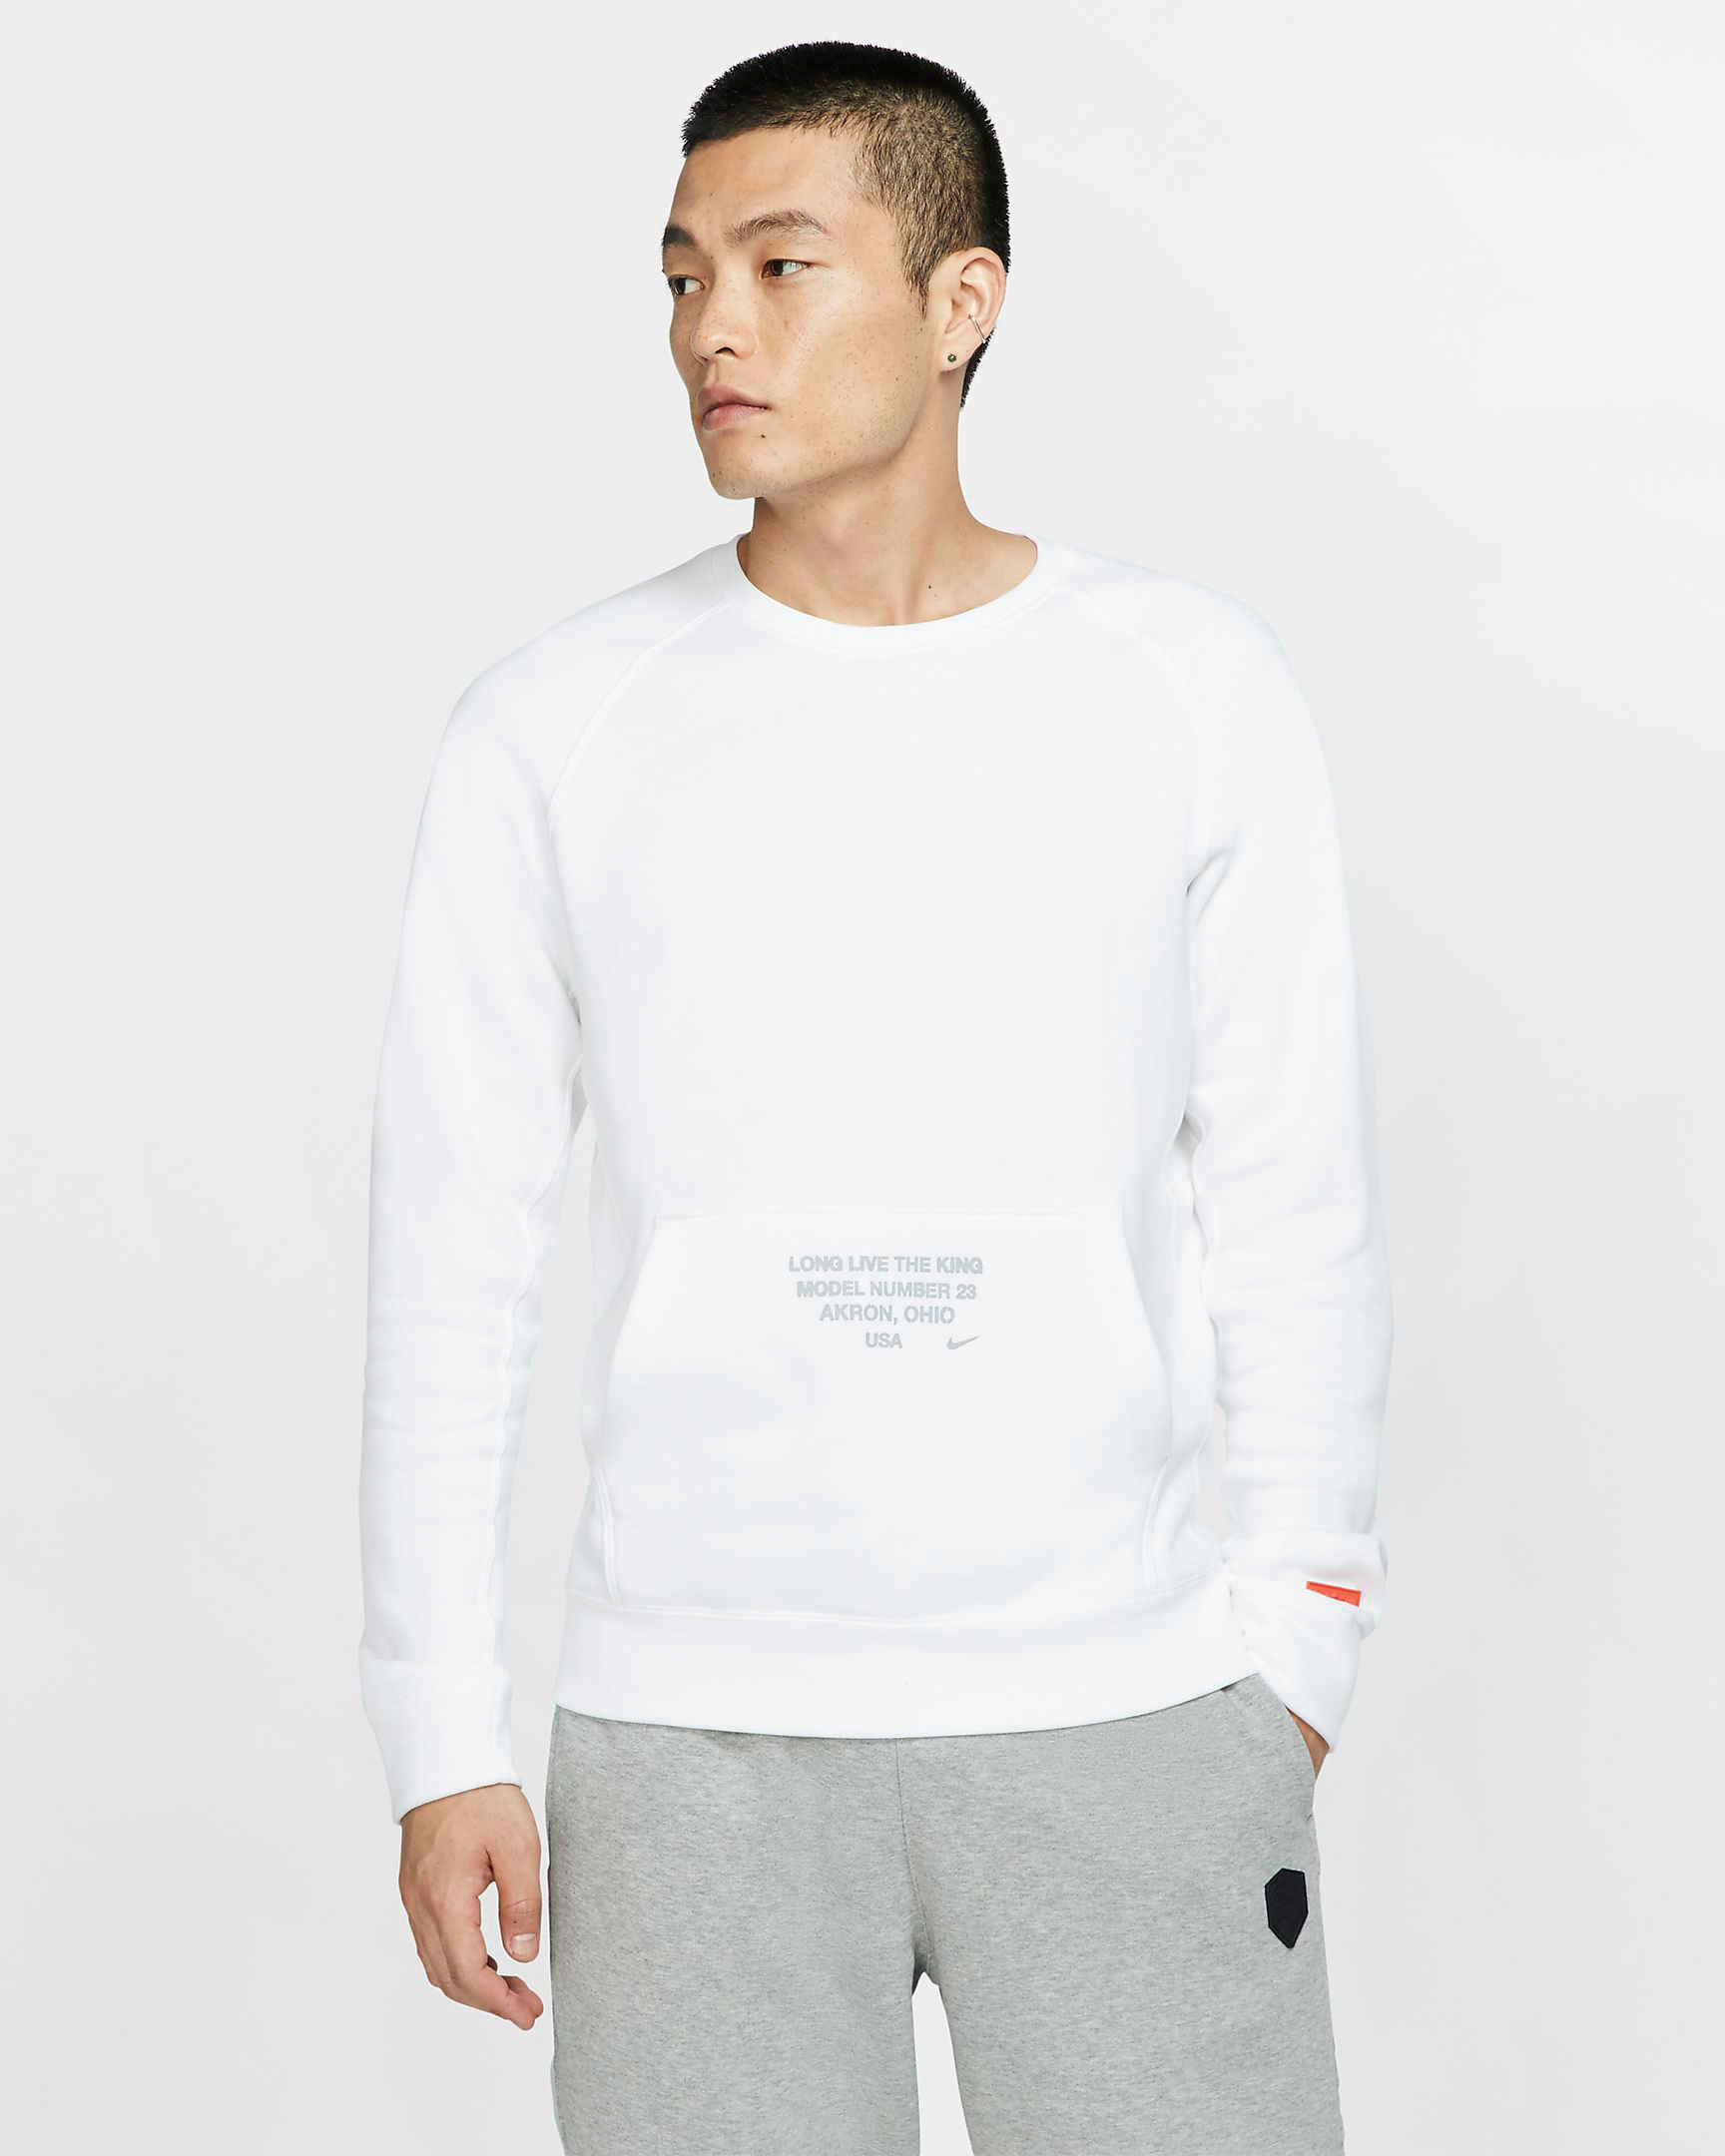 nike-lebron-17-black-white-crew-sweatshirt-match-1